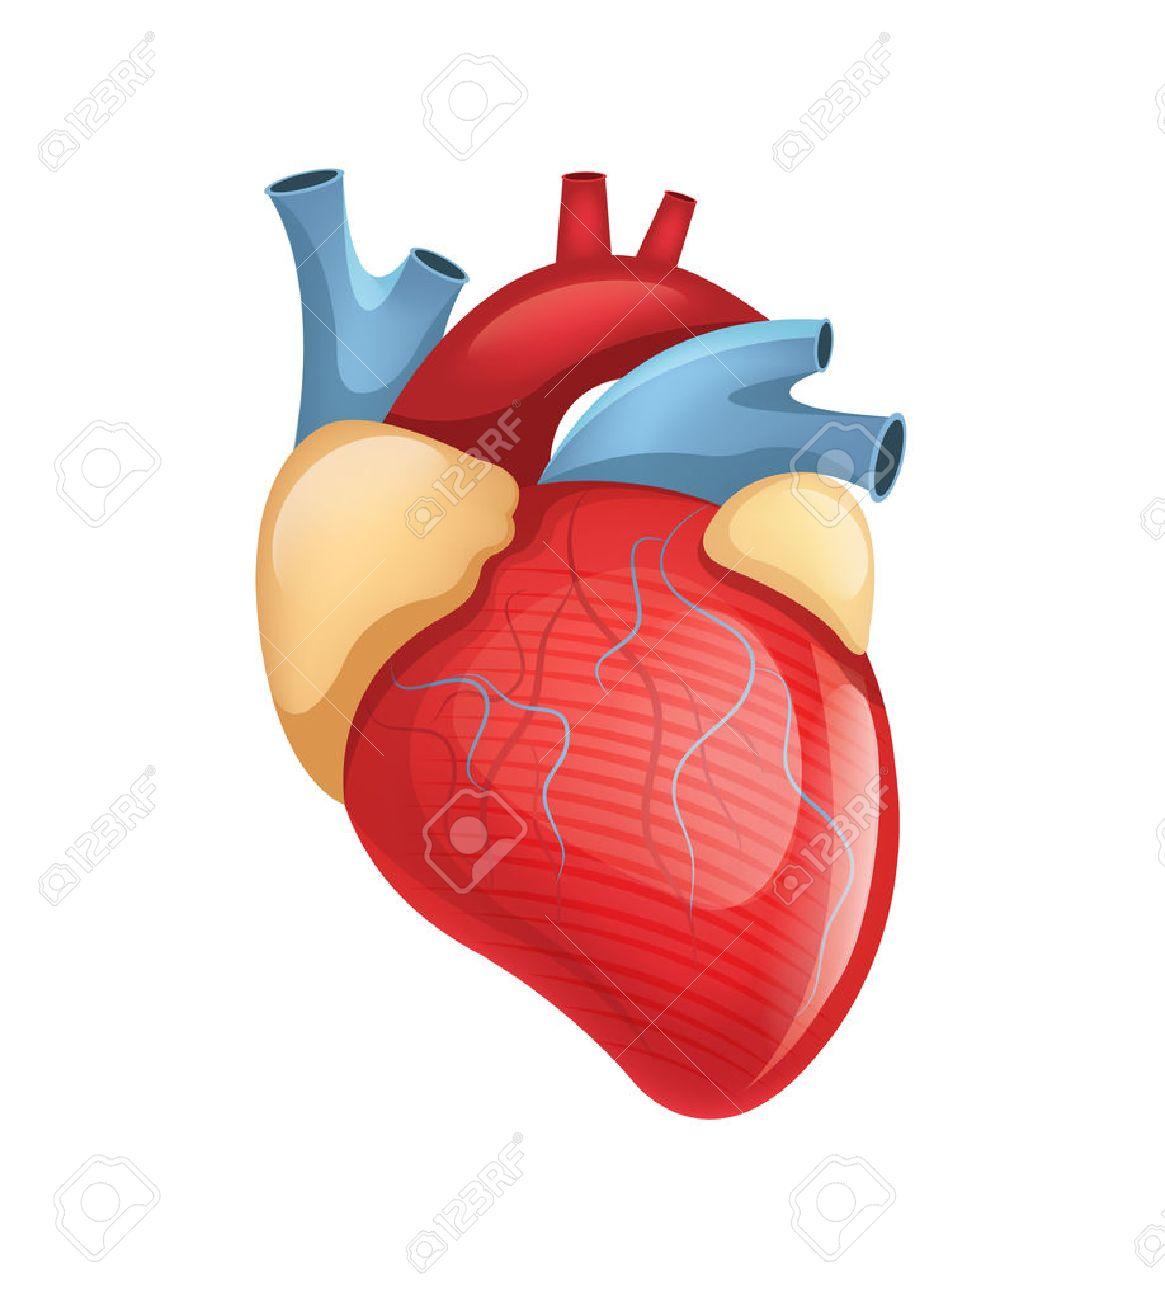 Vector human heart illustration royalty free cliparts vetores e imagens vector human heart illustration ccuart Choice Image